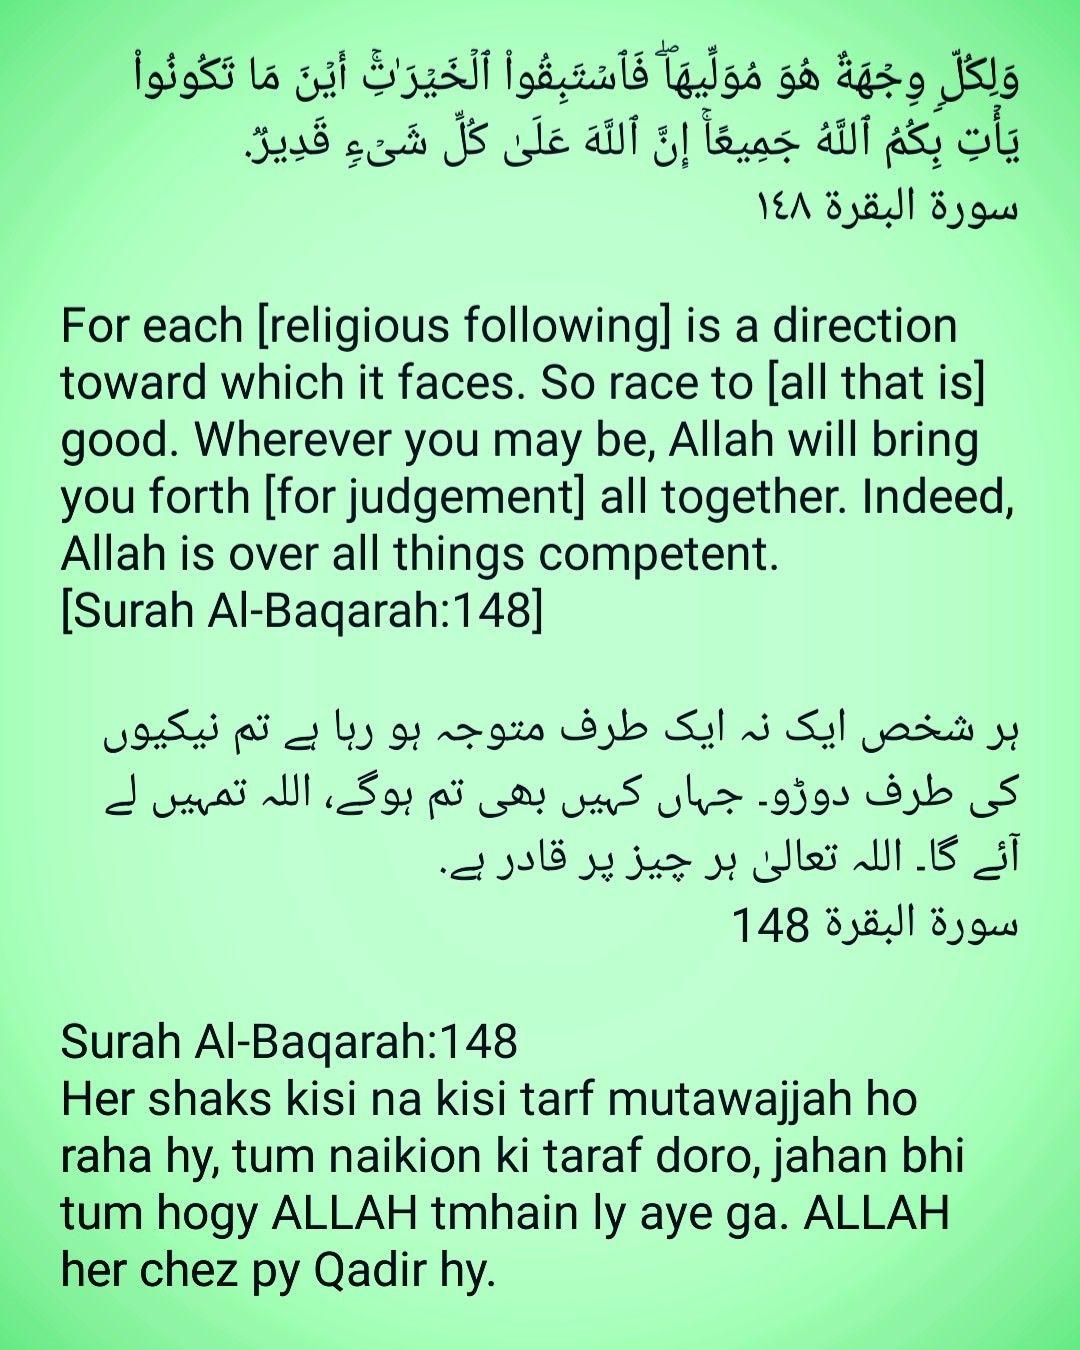 Tafsir Surat Al-Baqarah ayat 148